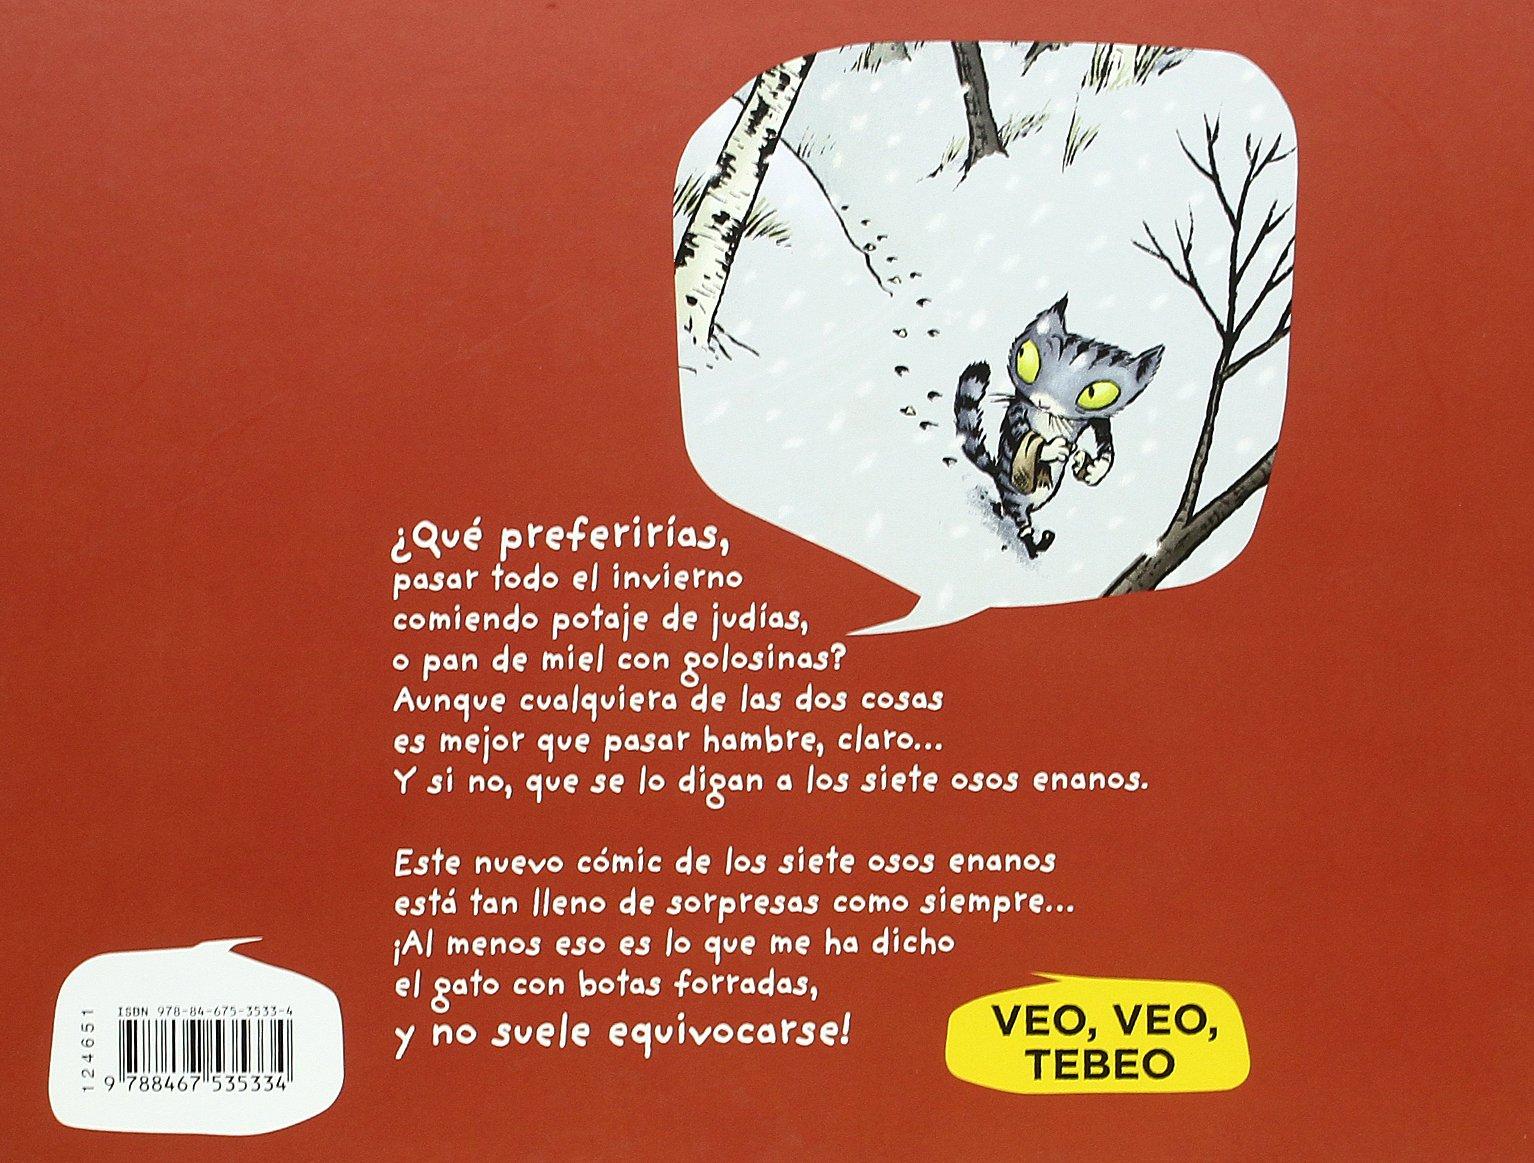 Los siete osos enanos pasan hambre/ The Seven Dwarf Bears Go Through Hunger (Spanish Edition): Emile Bravo: 9788467535334: Amazon.com: Books